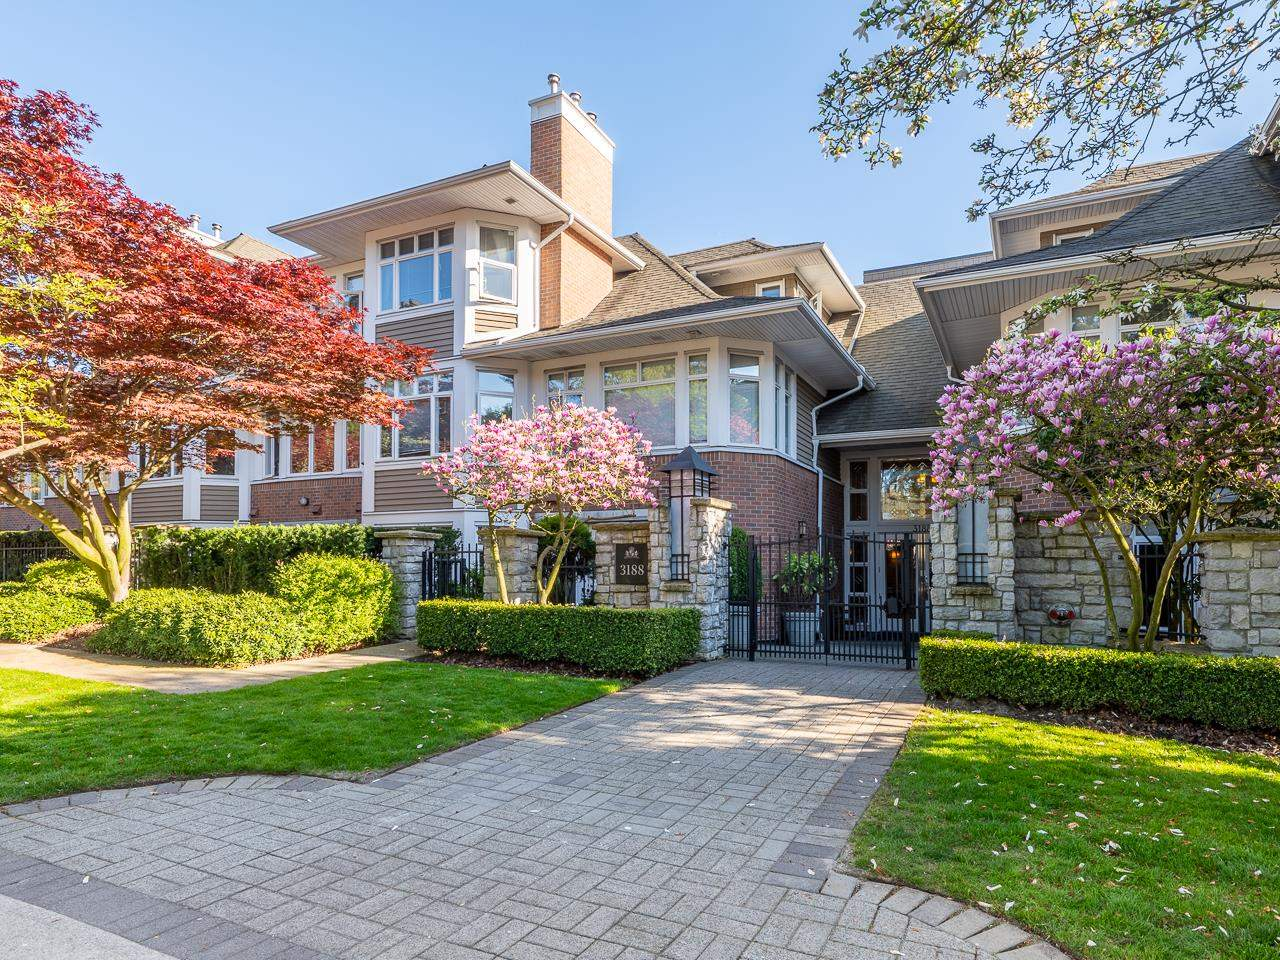 114 3188 W 41ST AVENUE - Kerrisdale Apartment/Condo for sale, 1 Bedroom (R2595820)